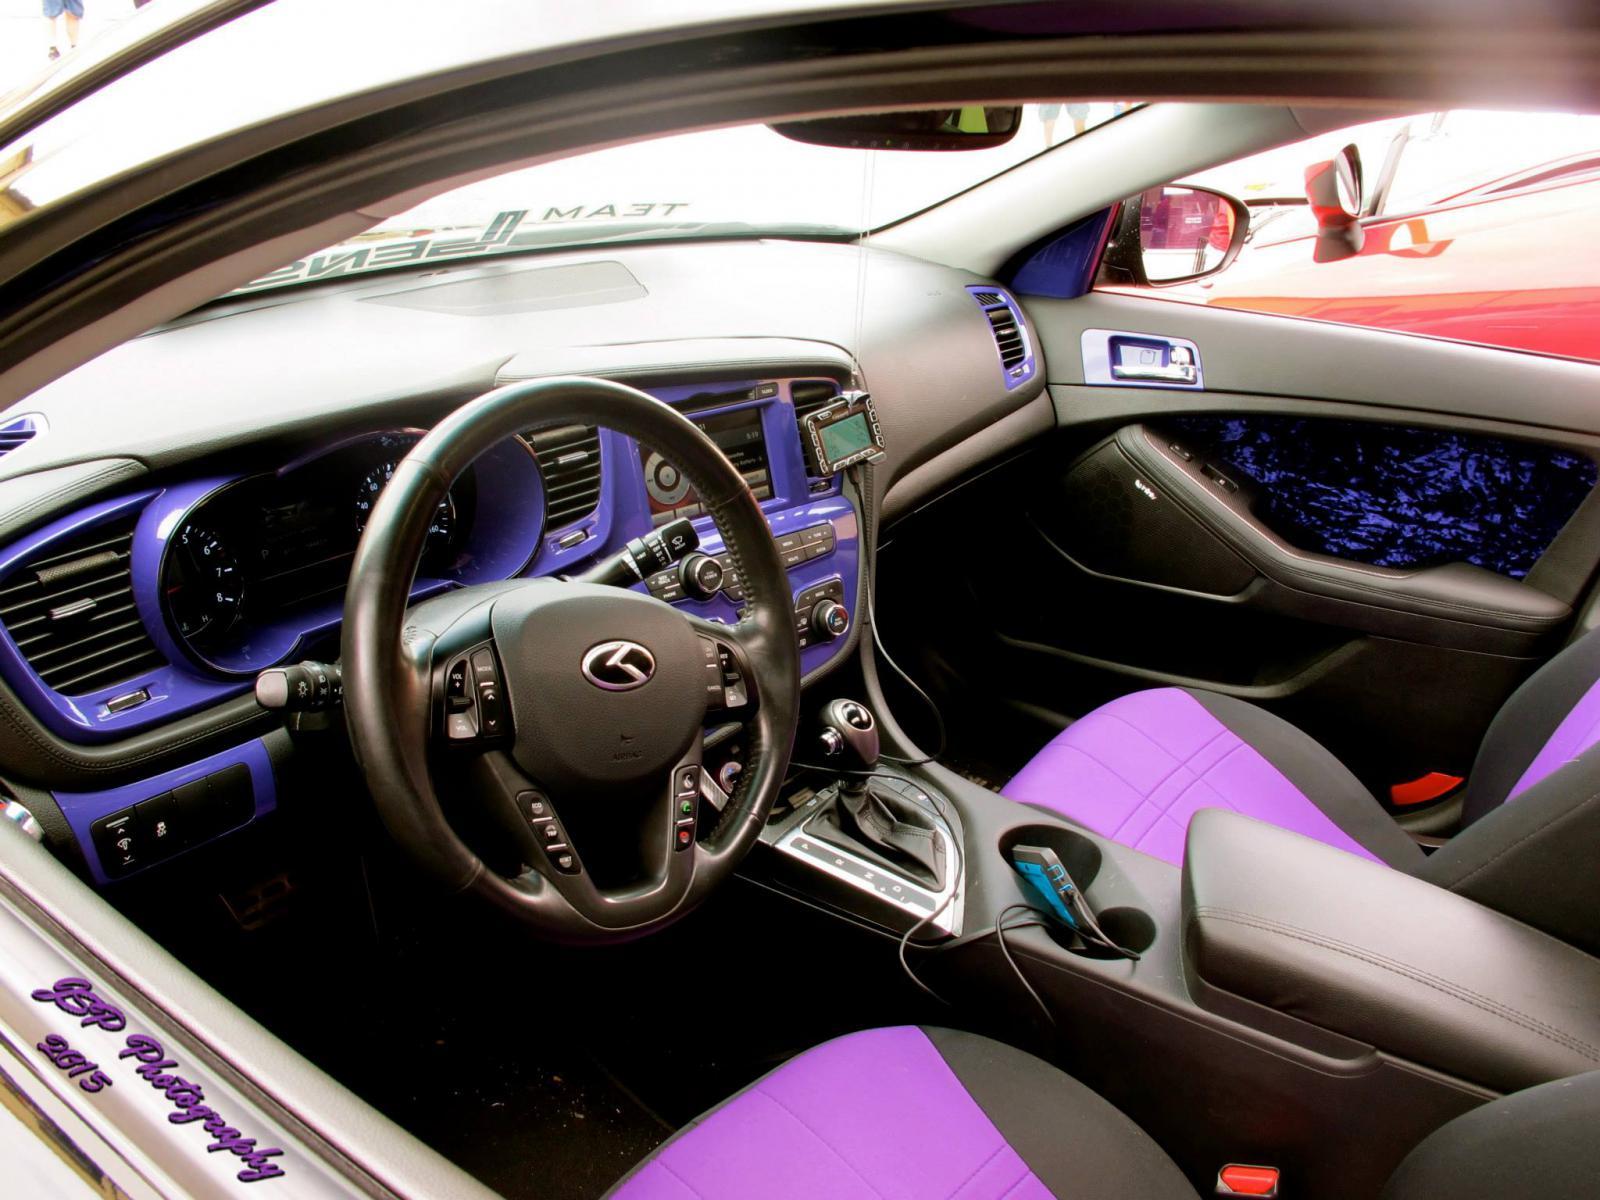 CalTrend Black Purple Neoprene Seat Covers 10986809 1630435770506014 6902993375232684155 O